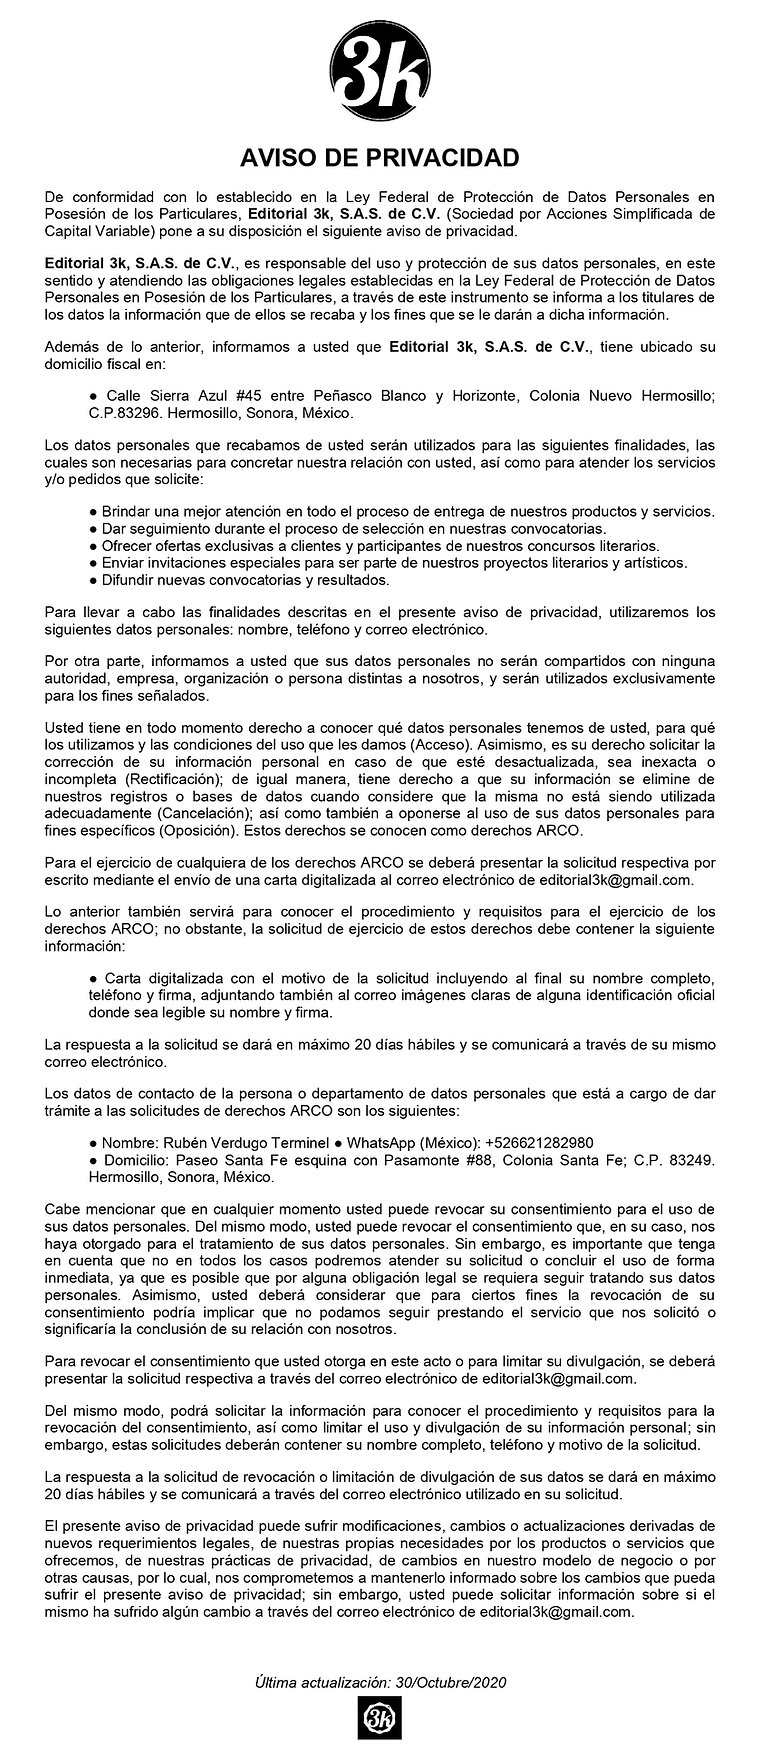 JPG Aviso de Privacidad E3k2020 (30.Octu